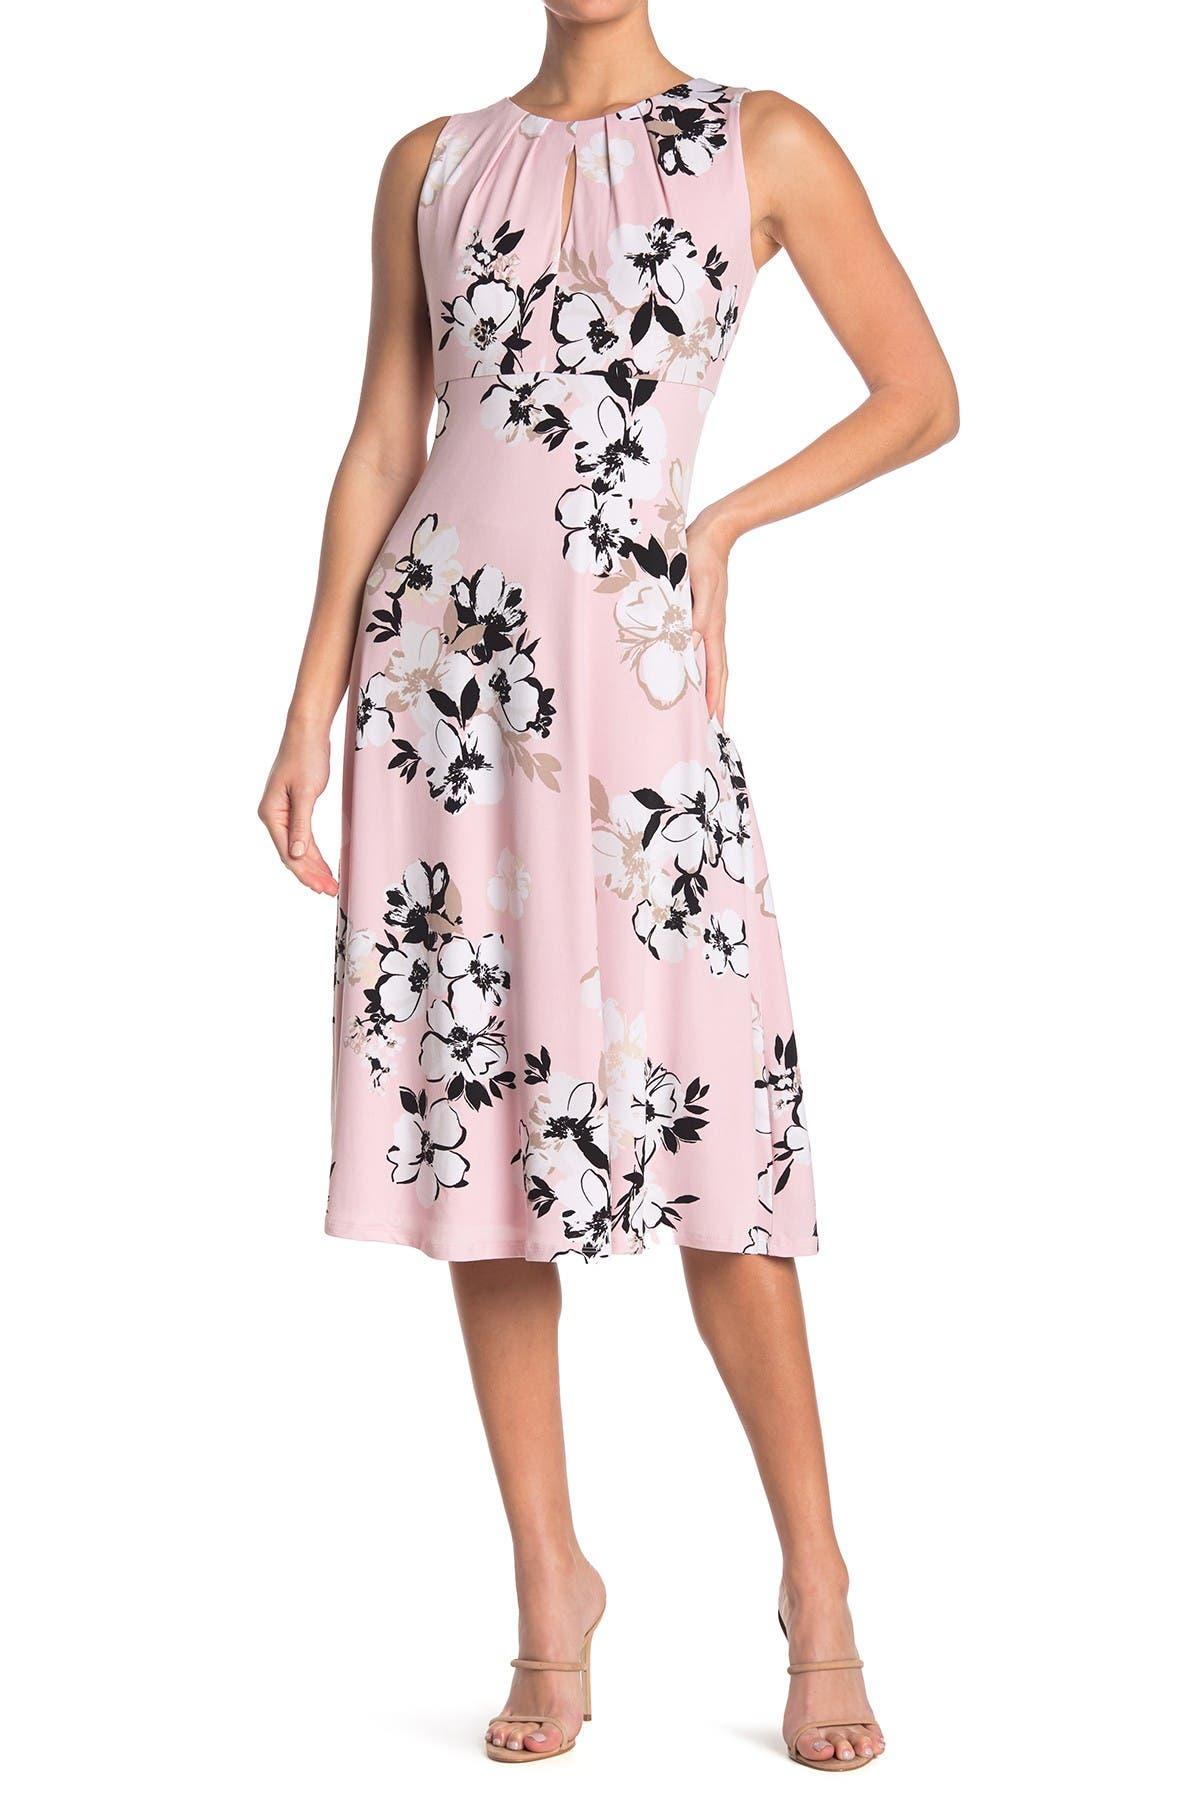 Image of London Times Jersey Floral Print Midi Dress